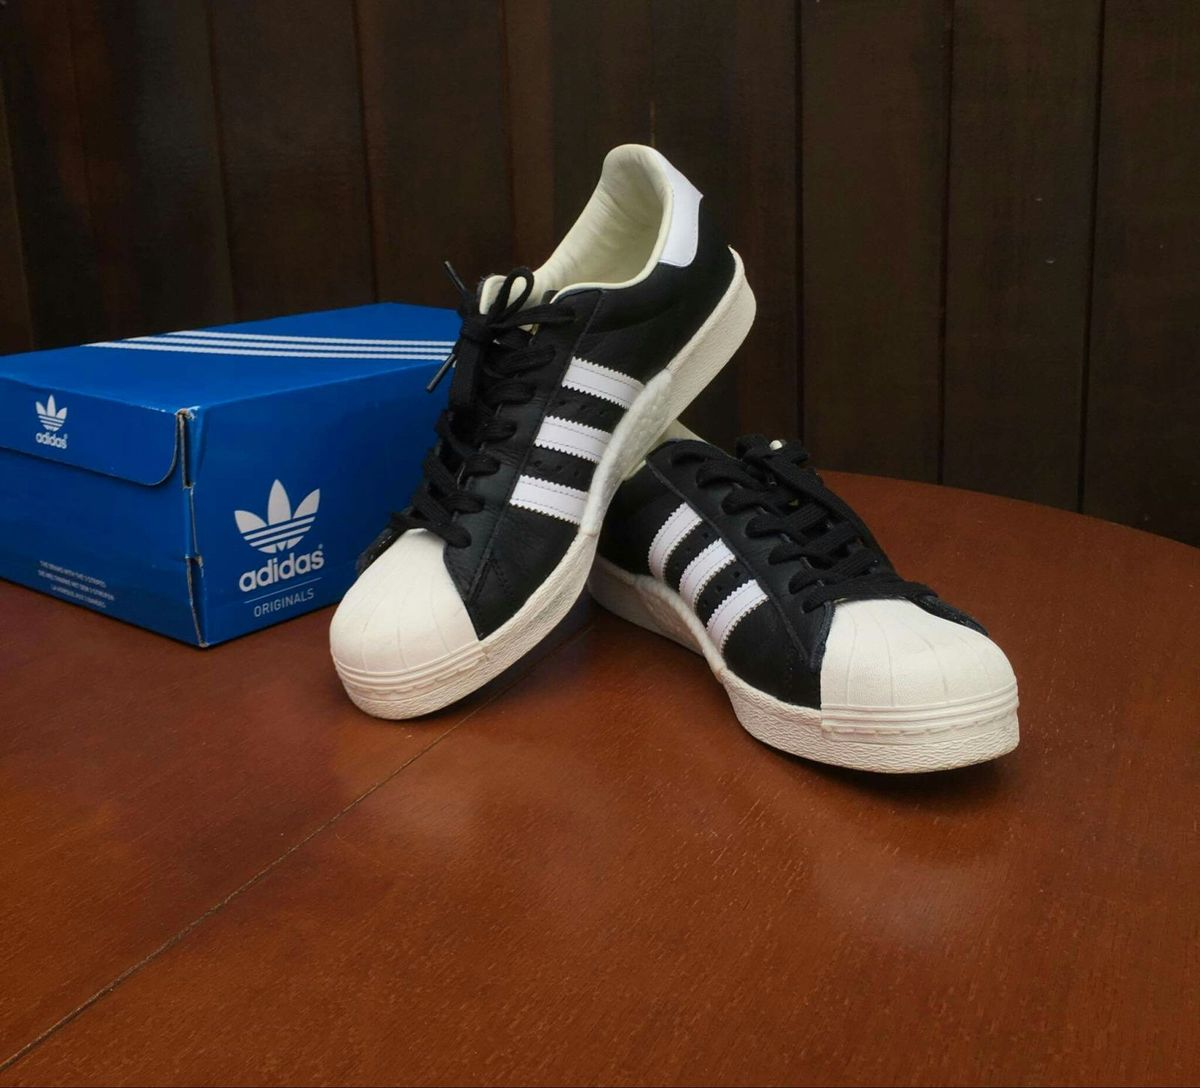 6642f46e4 adidas superstar boost - tênis adidas.  Czm6ly9wag90b3muzw5qb2vplmnvbs5ici9wcm9kdwn0cy81nzuymjq5lzq0mmyzodhhyzhlnjzhzdq2mdixmtaymti0ymuzzwjklmpwzw  ...